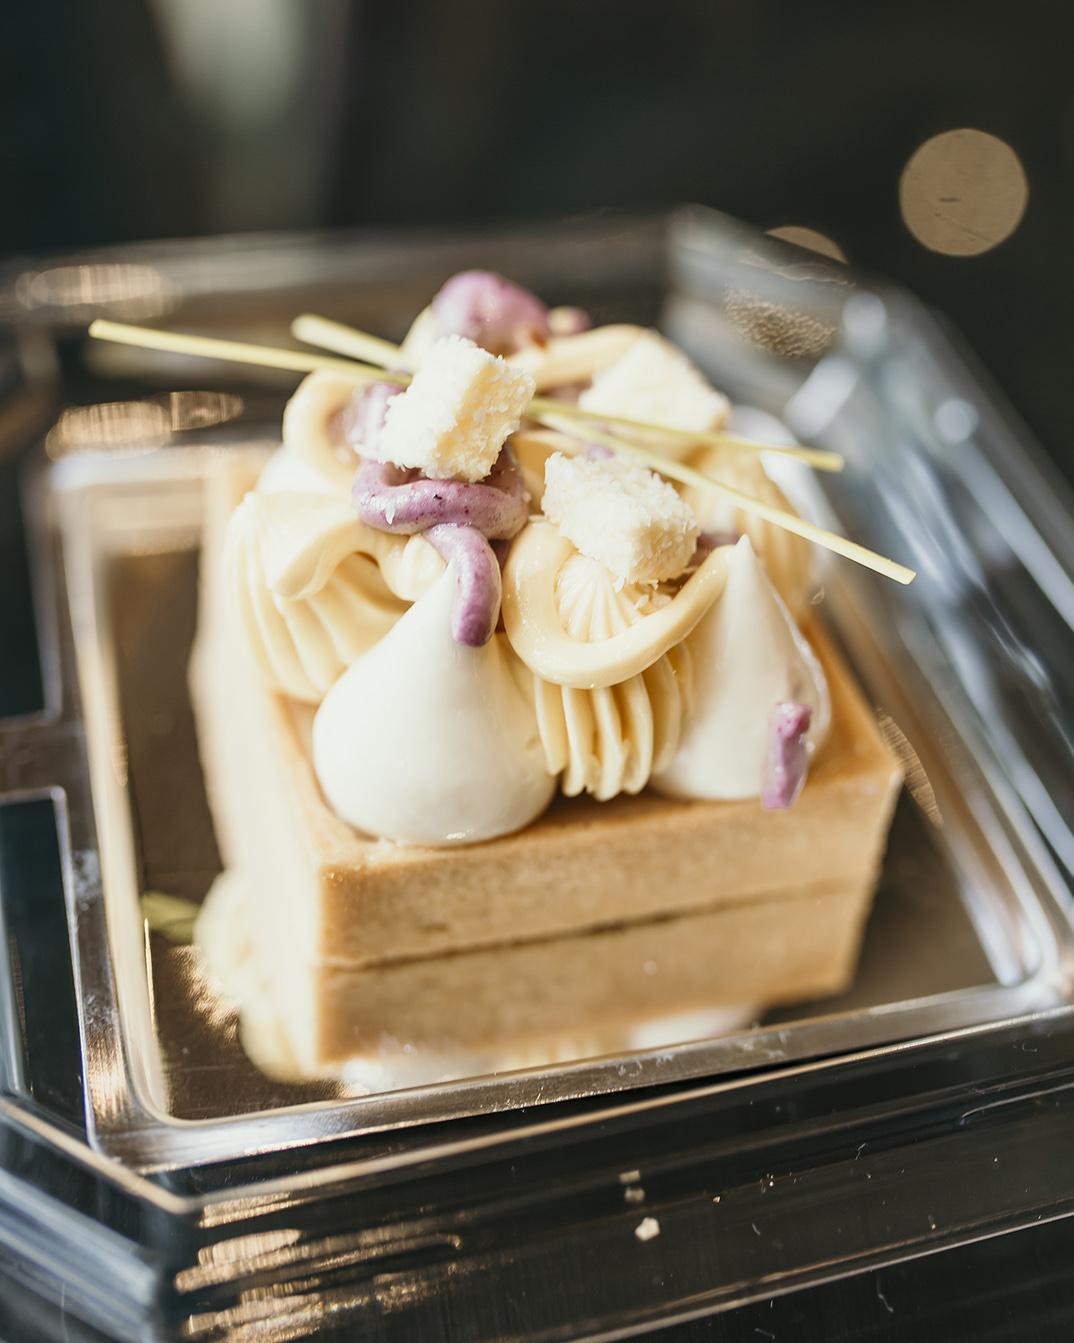 Lemon pie patisserie at the Bellagio Hotel in Las Vegas